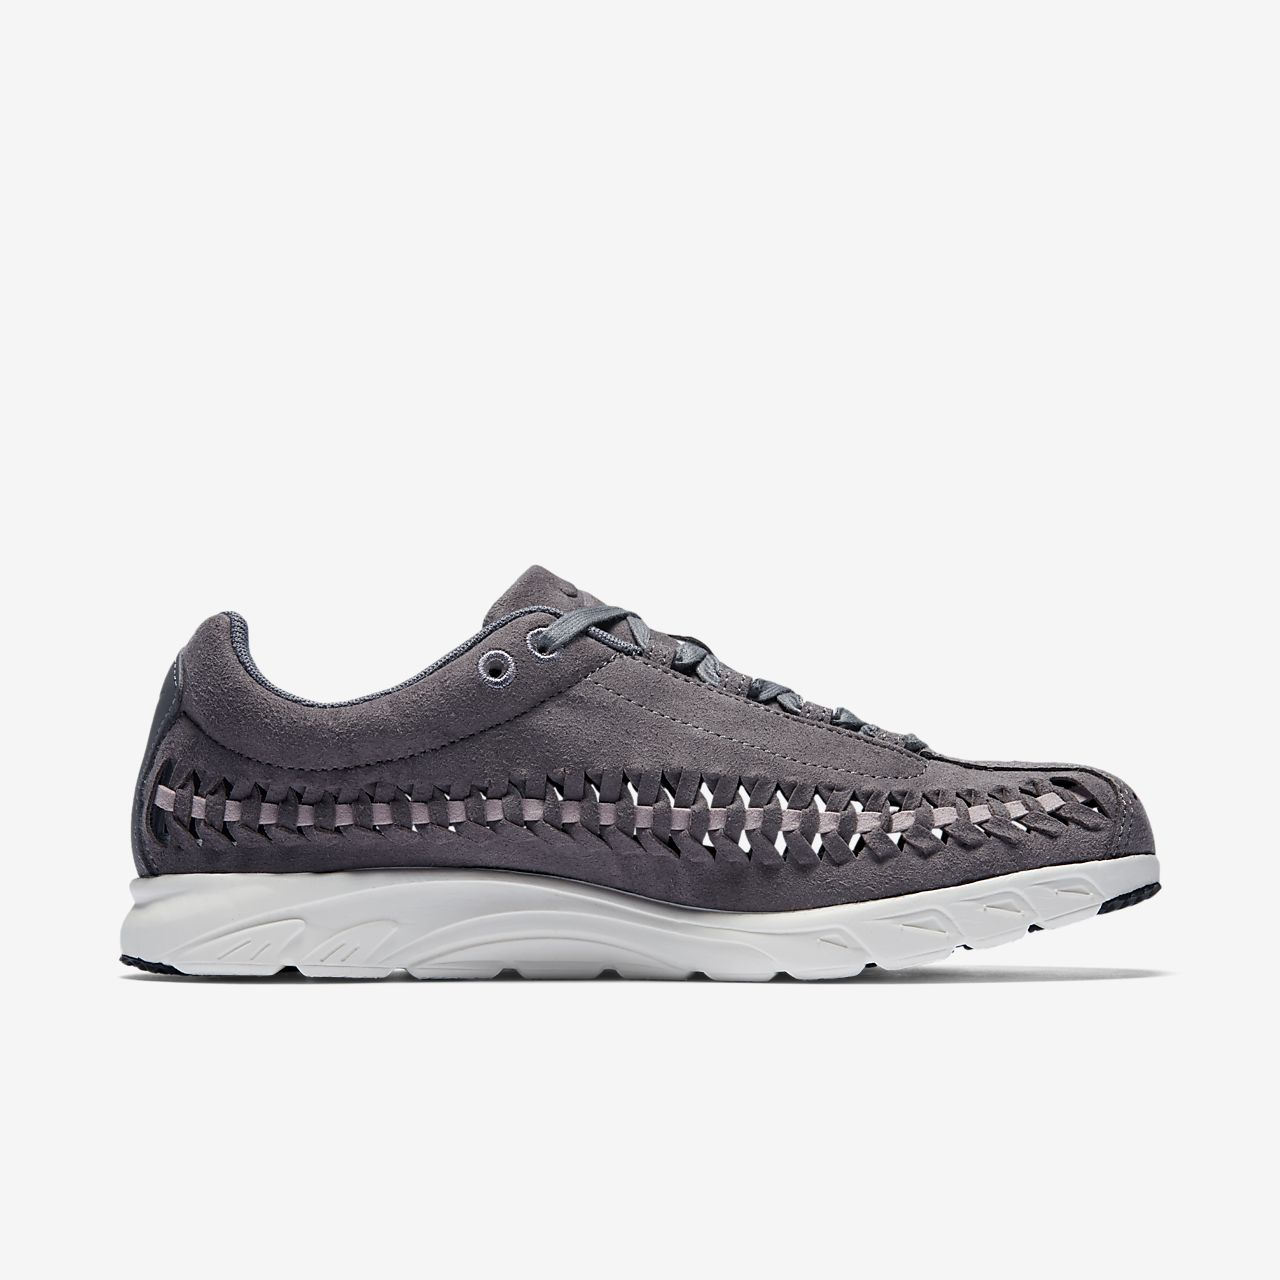 Chaussures De Sport Lage Mayfly Tissés W Nike Fmk80VK2i